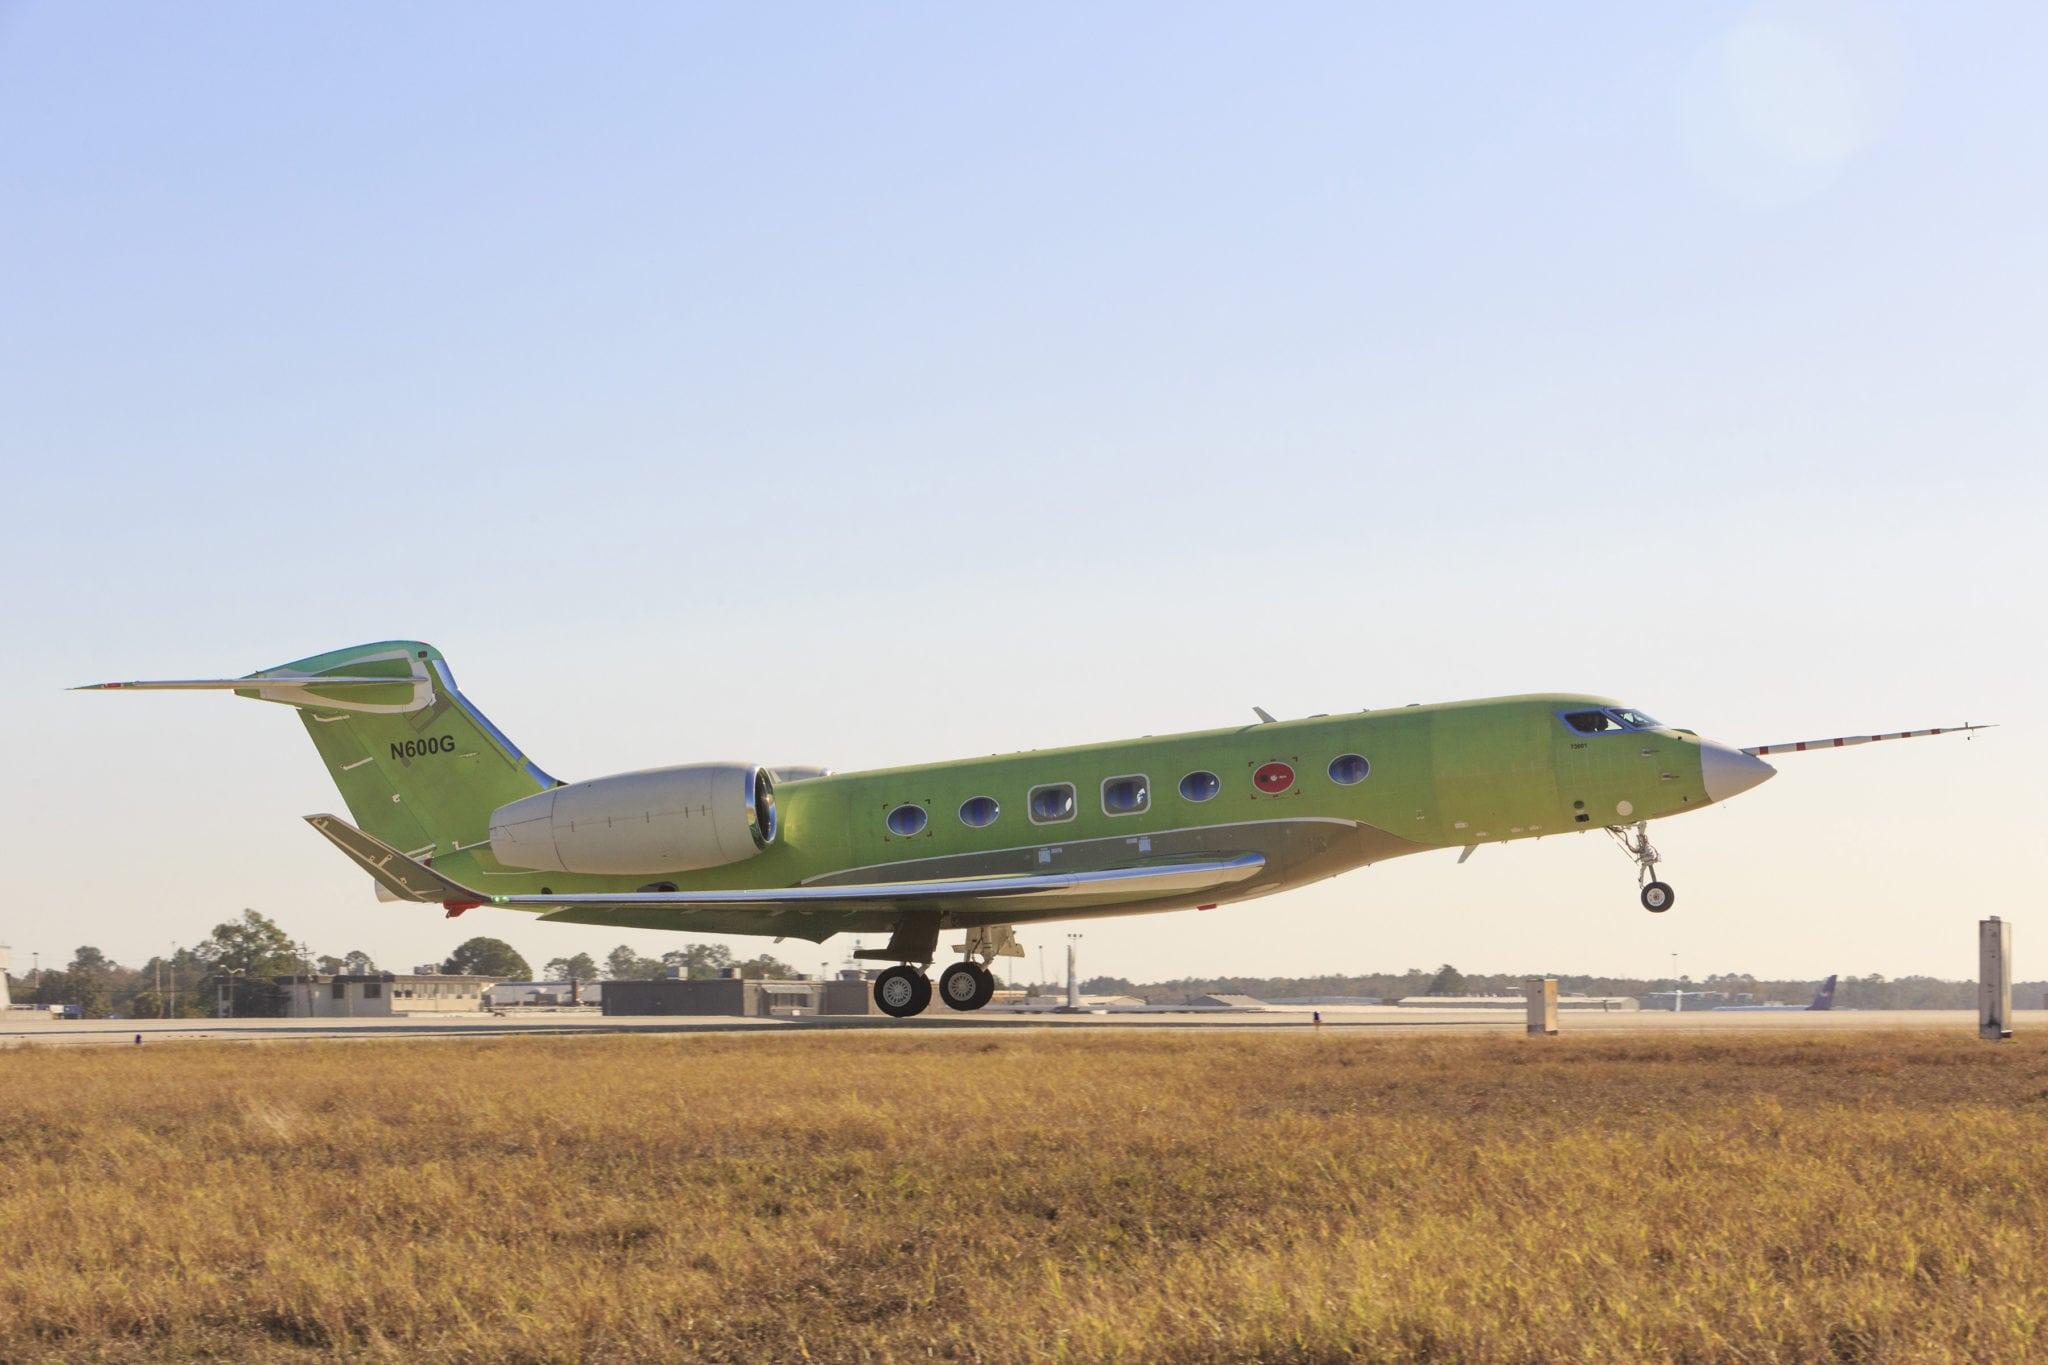 The first flight of the Gulfstream G600 test aircraft. Photo: Gulfstream